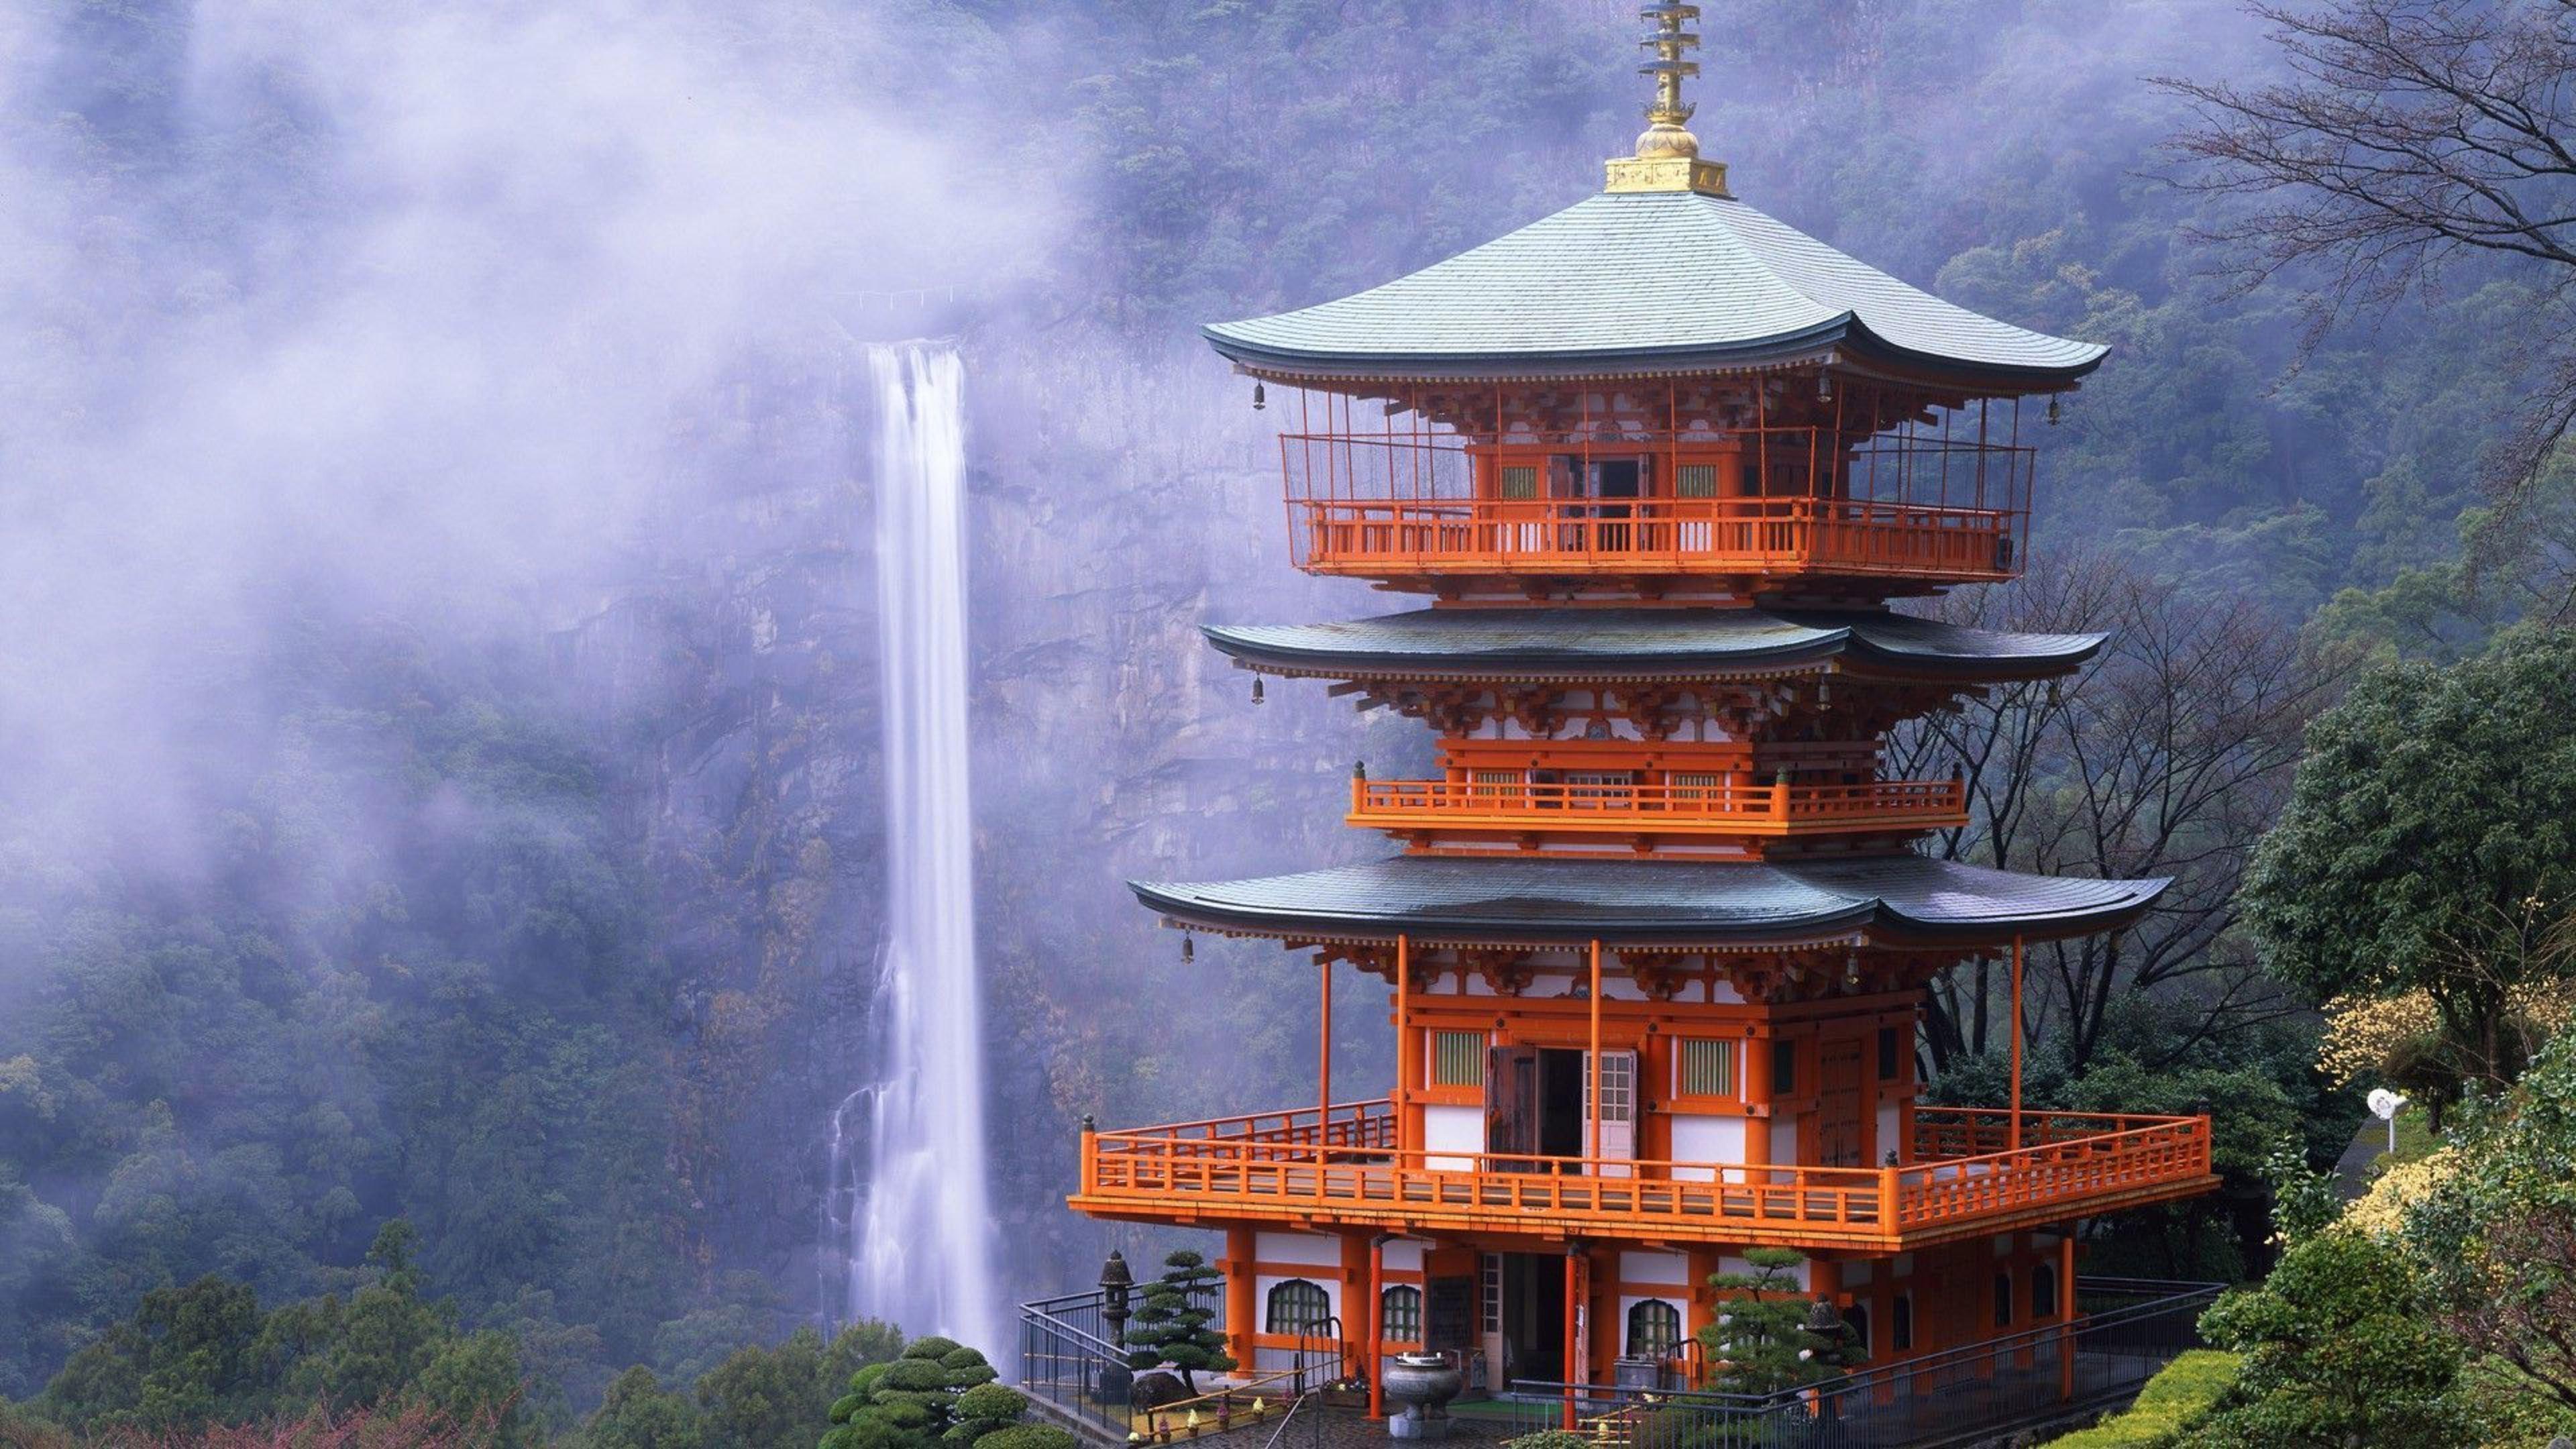 Hd wallpaper japan - Seiganto Ji Temple In Japan 4k Wallpaper